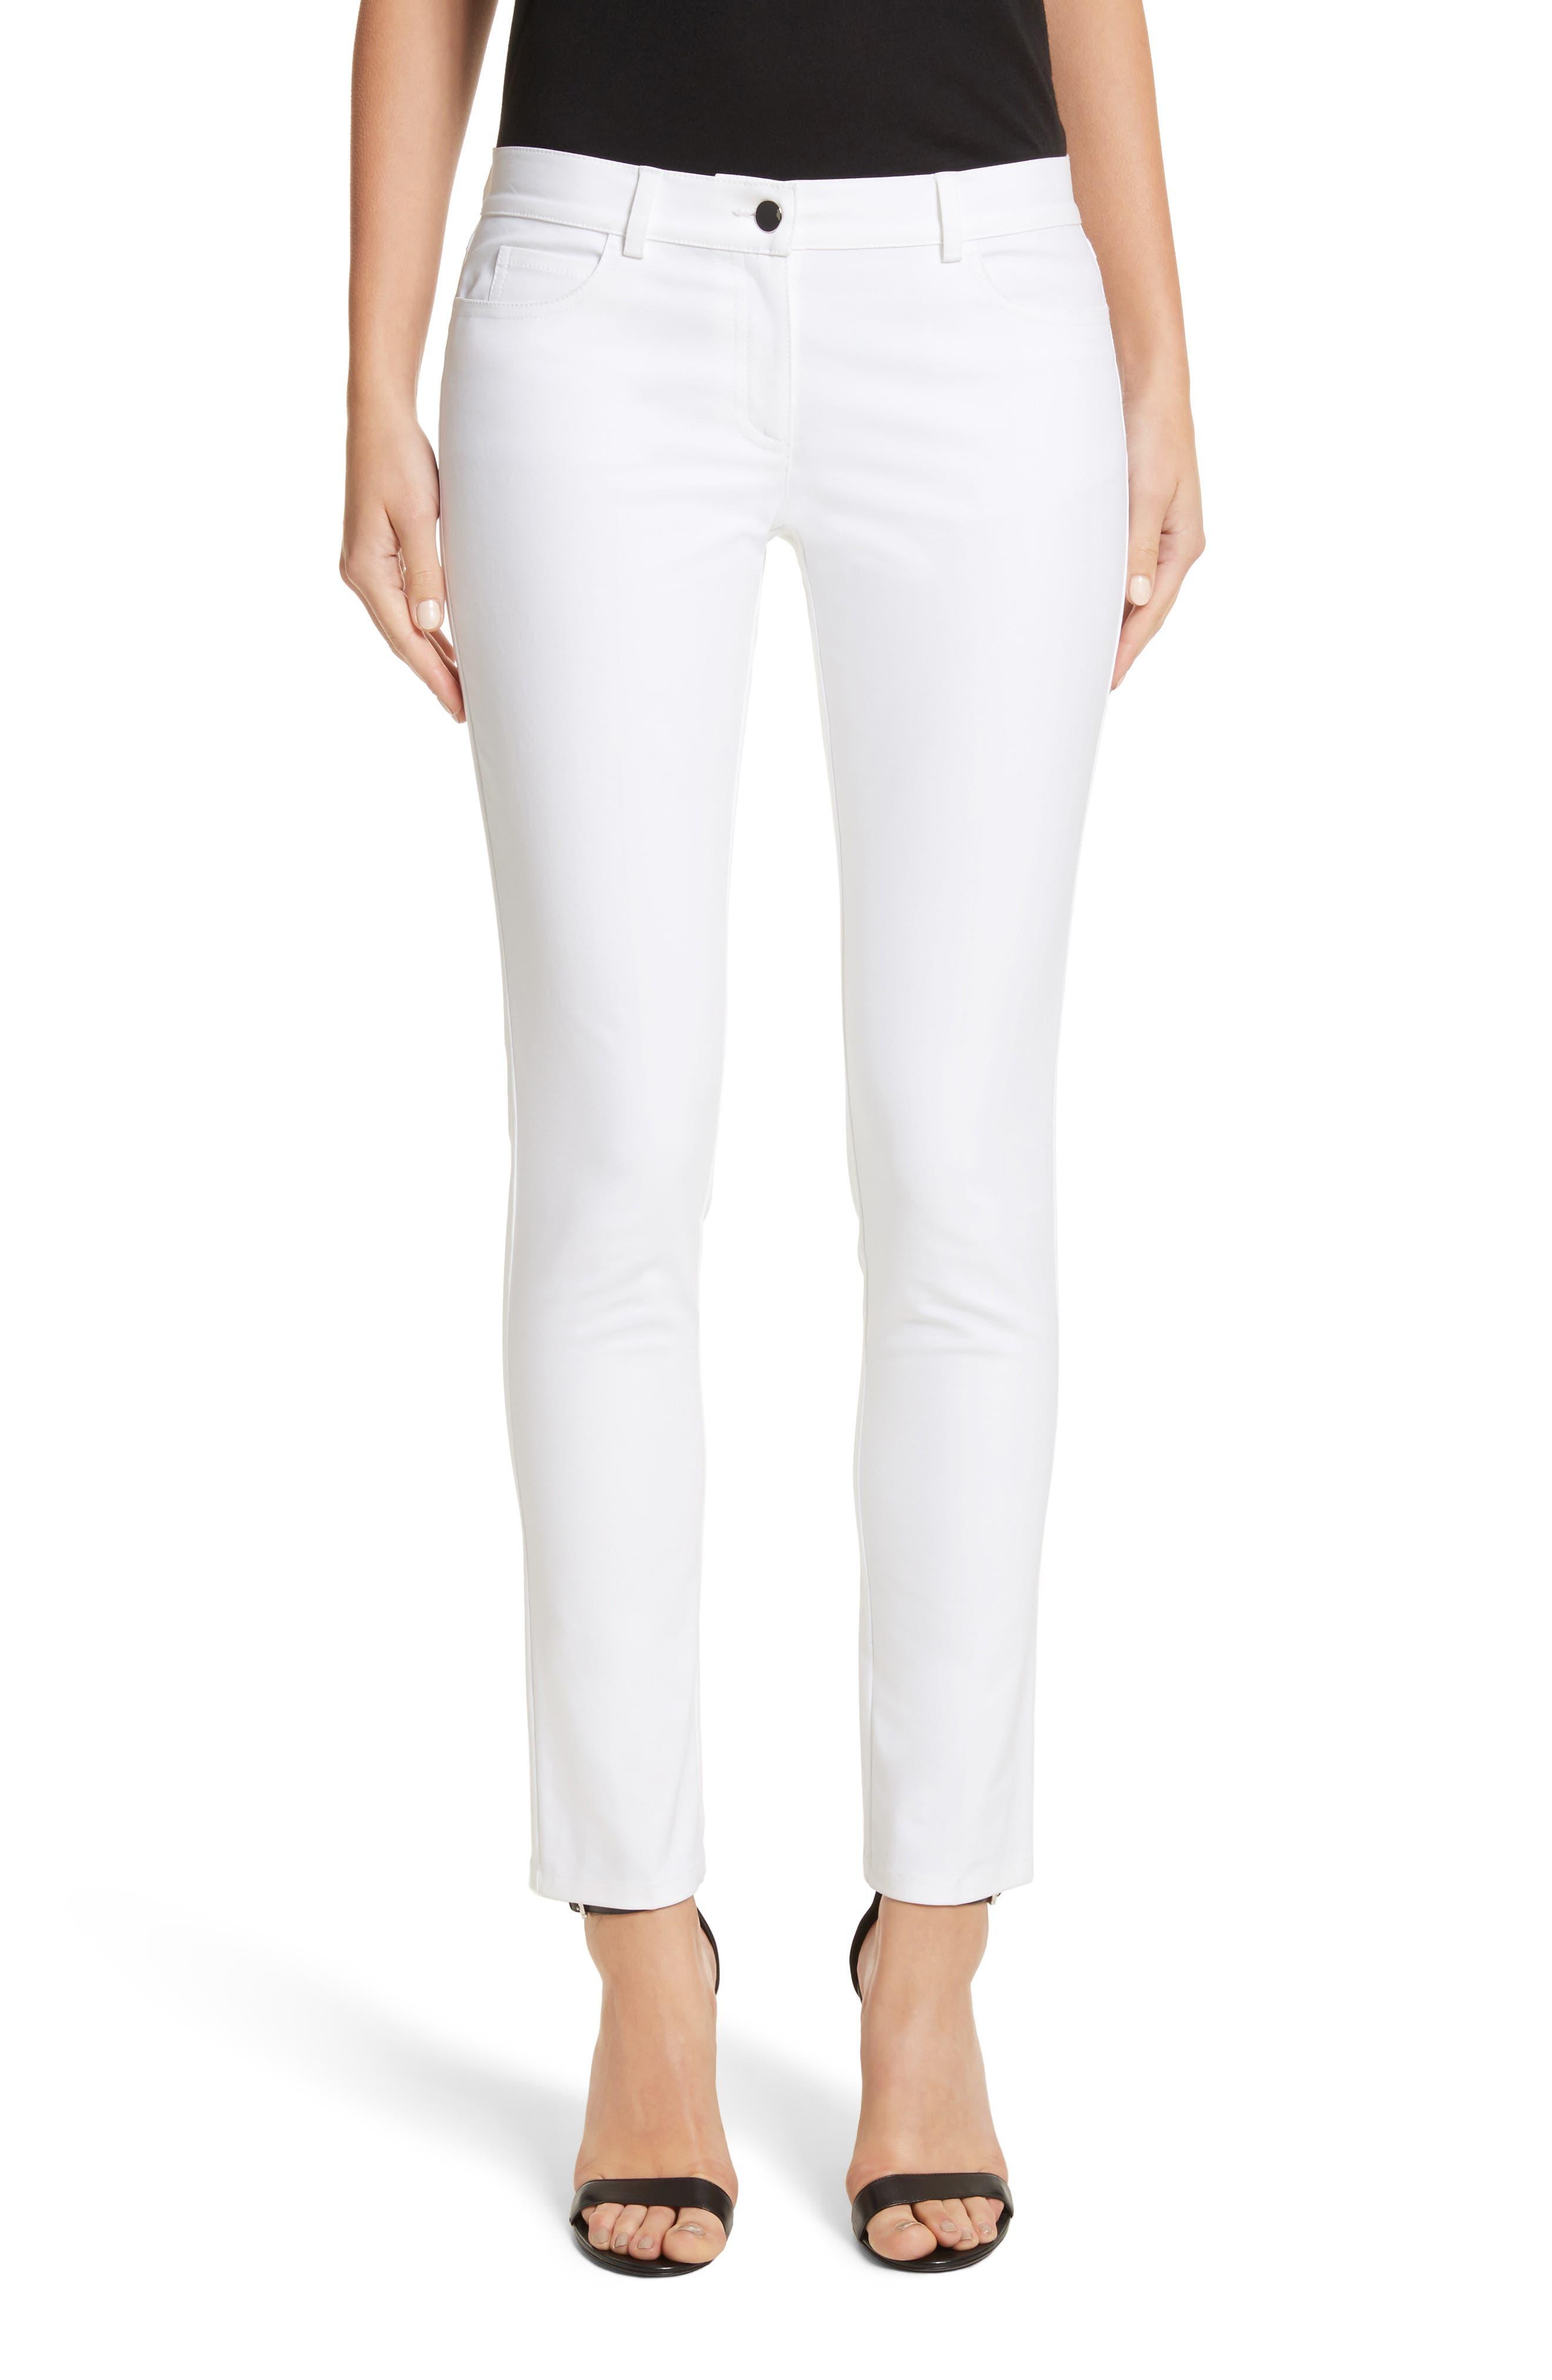 Main Image - Michael Kors Samantha Skinny Jeans (Optic White)